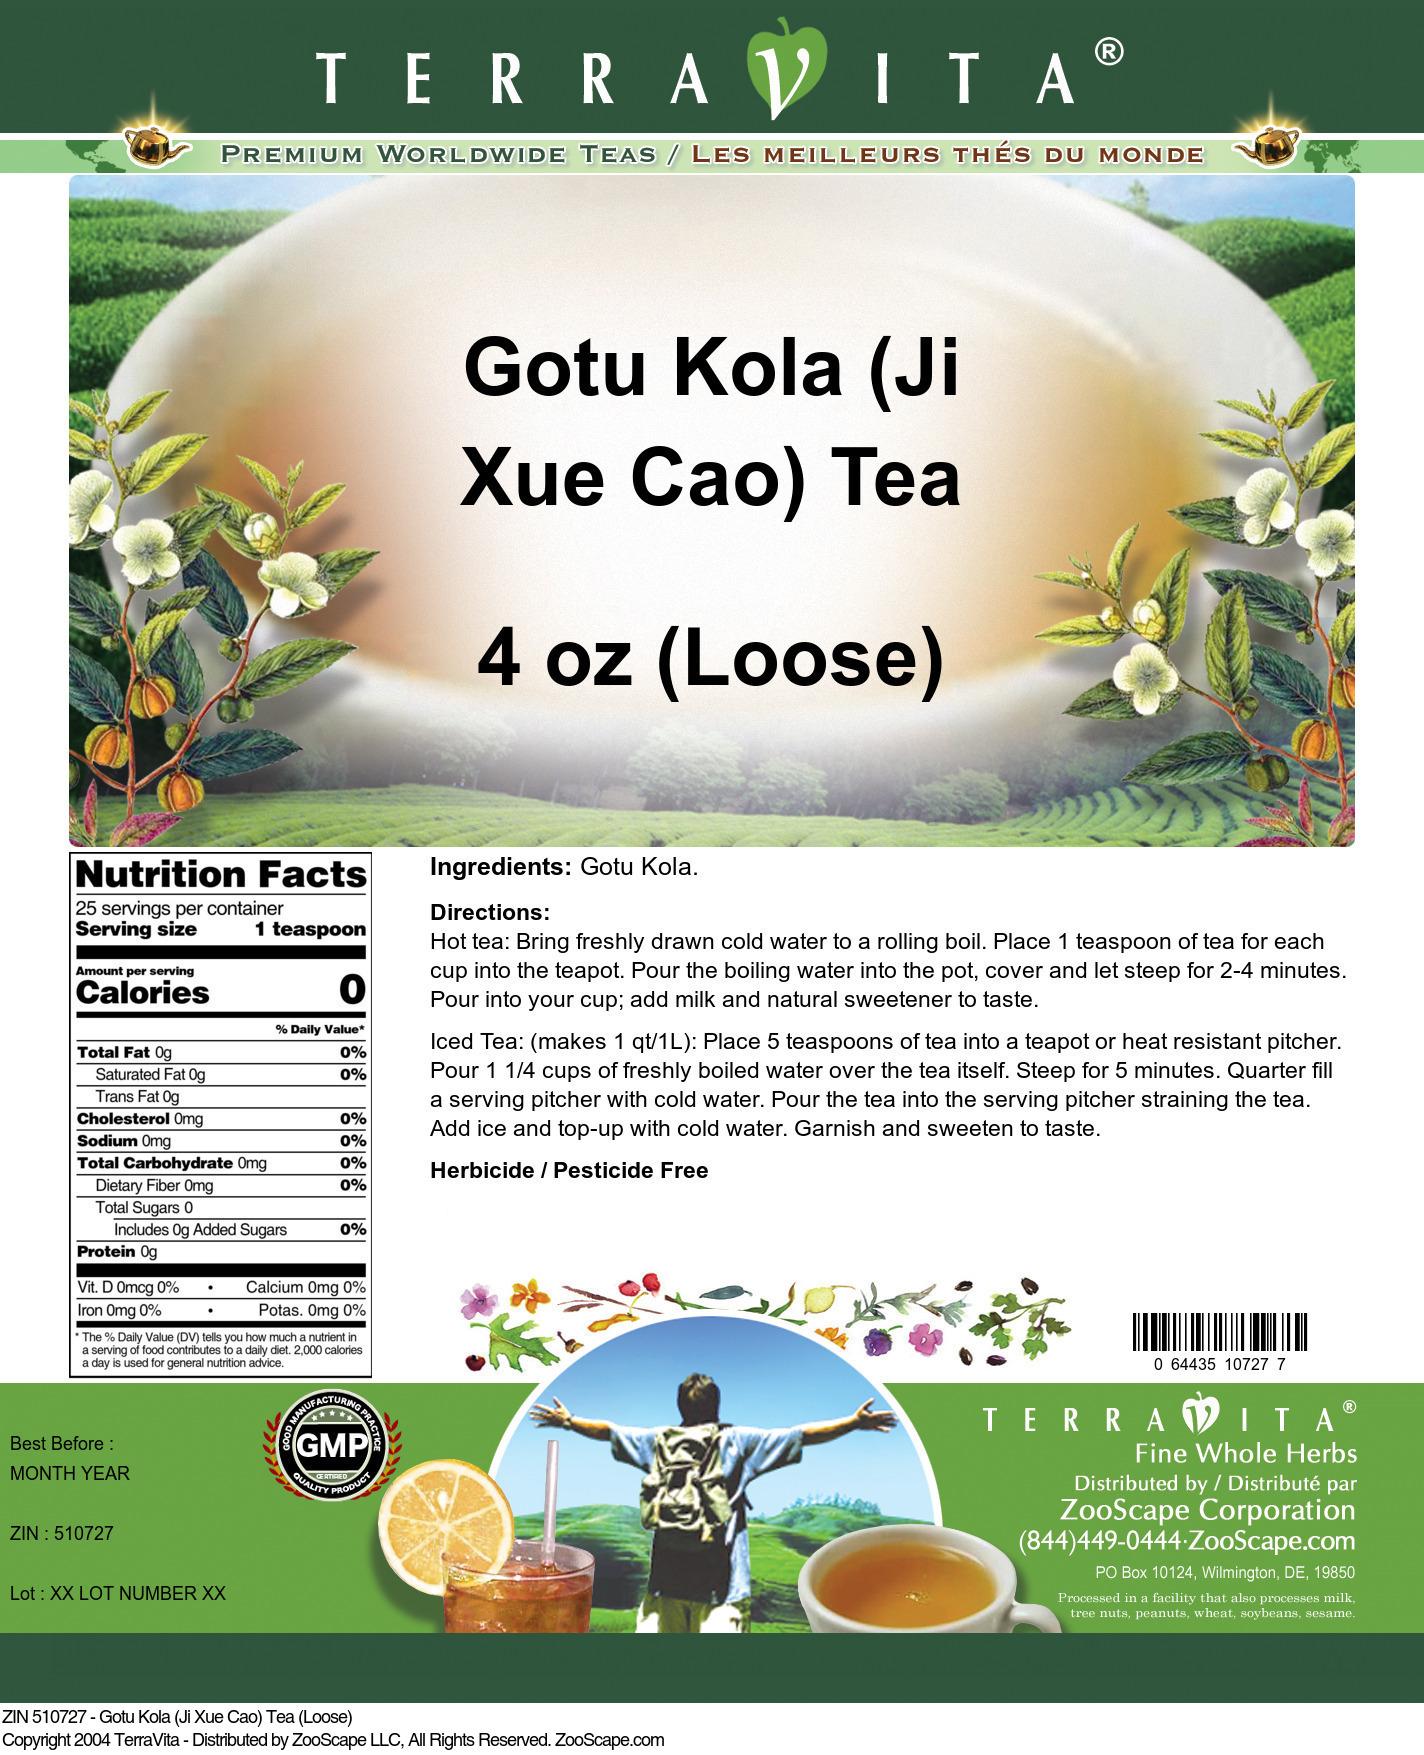 Gotu Kola (Ji Xue Cao) Tea (Loose)